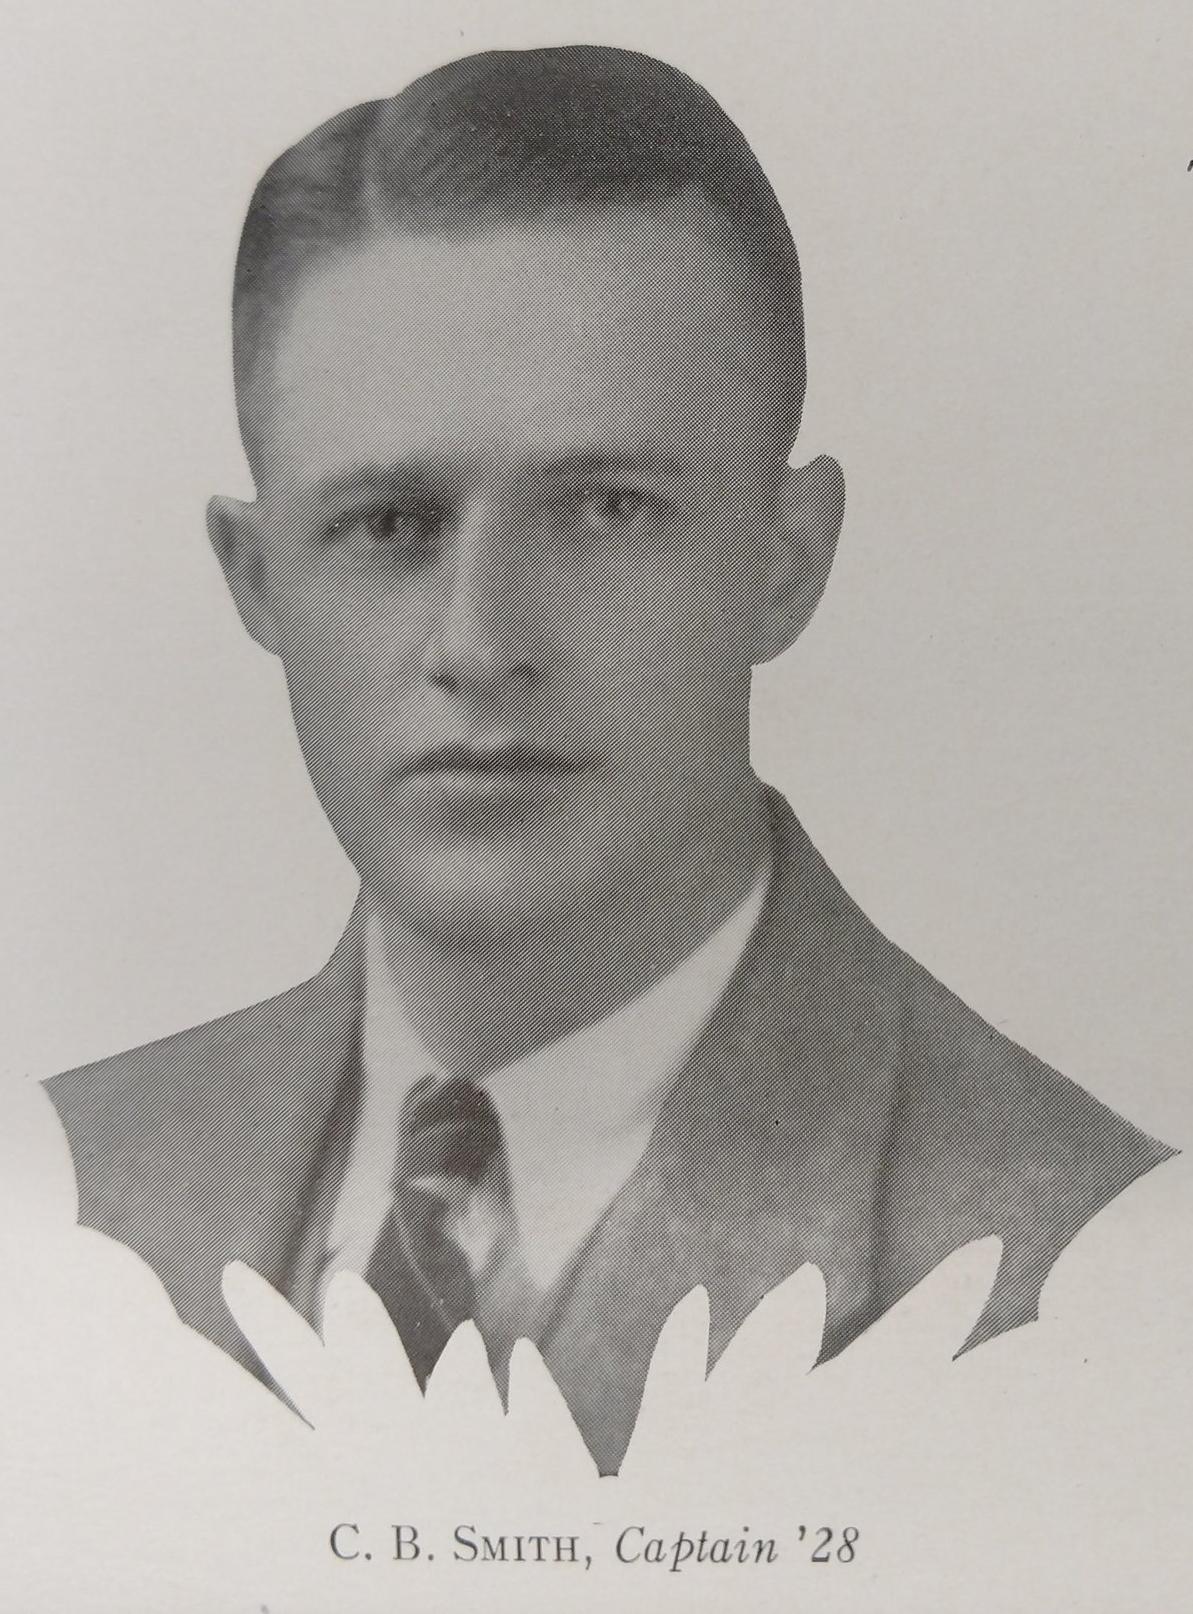 Captain C. B. Smith